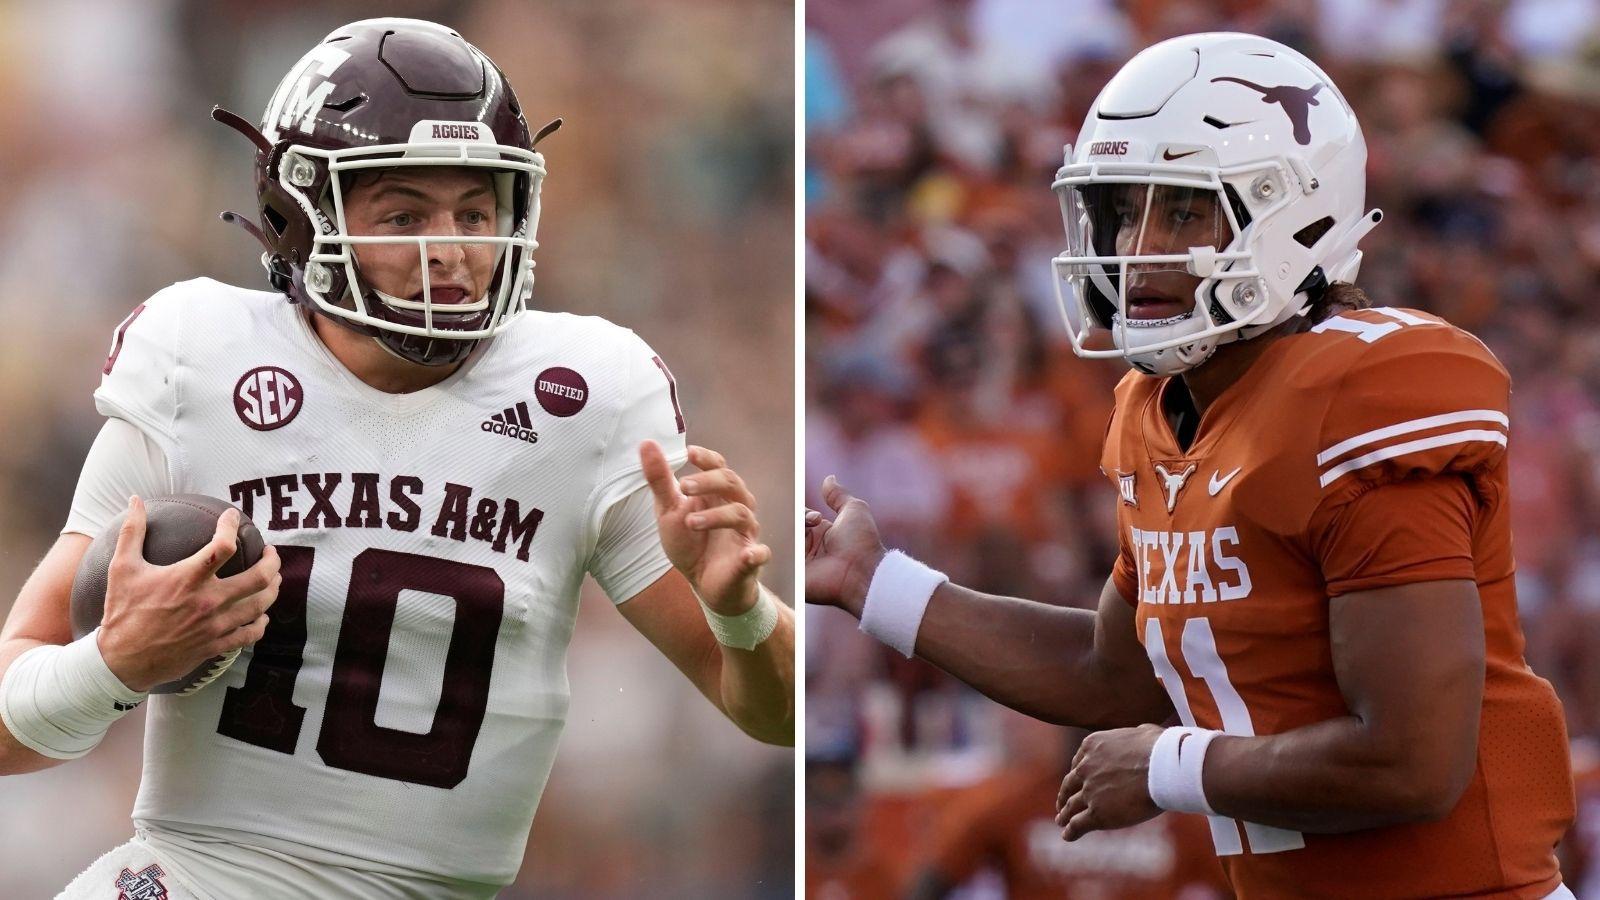 Texas A&M QB Zach Calzada (left) and Texas QB Casey Thompson (right). (Photos from The Associated Press)